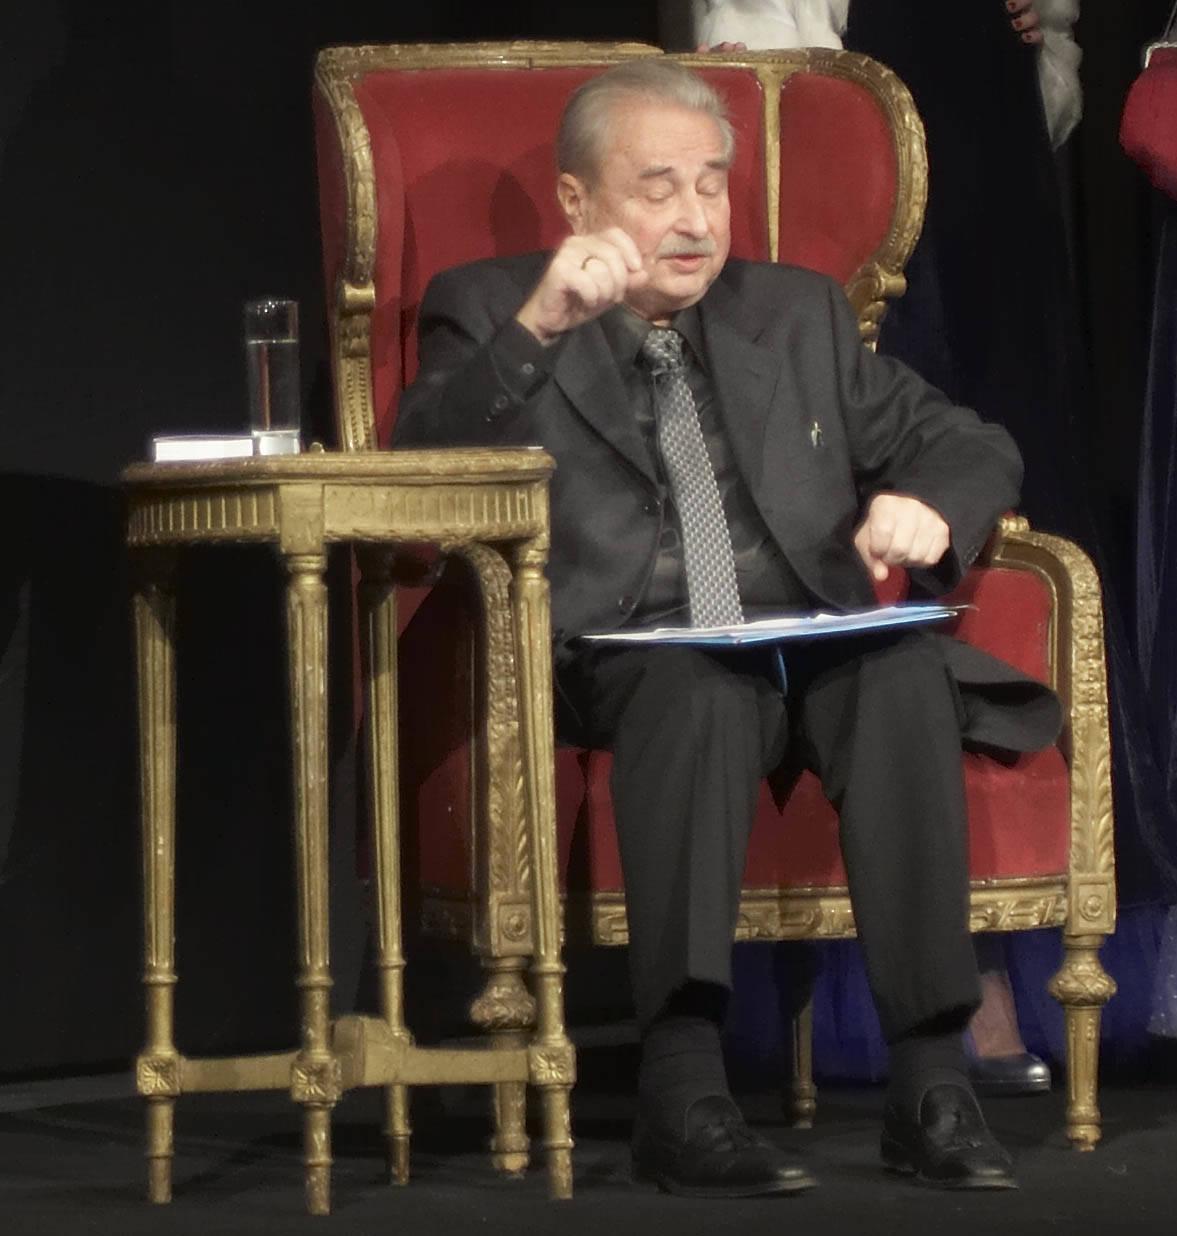 Drugo telo, Milorad Pavić, Narodno pozorište 2008